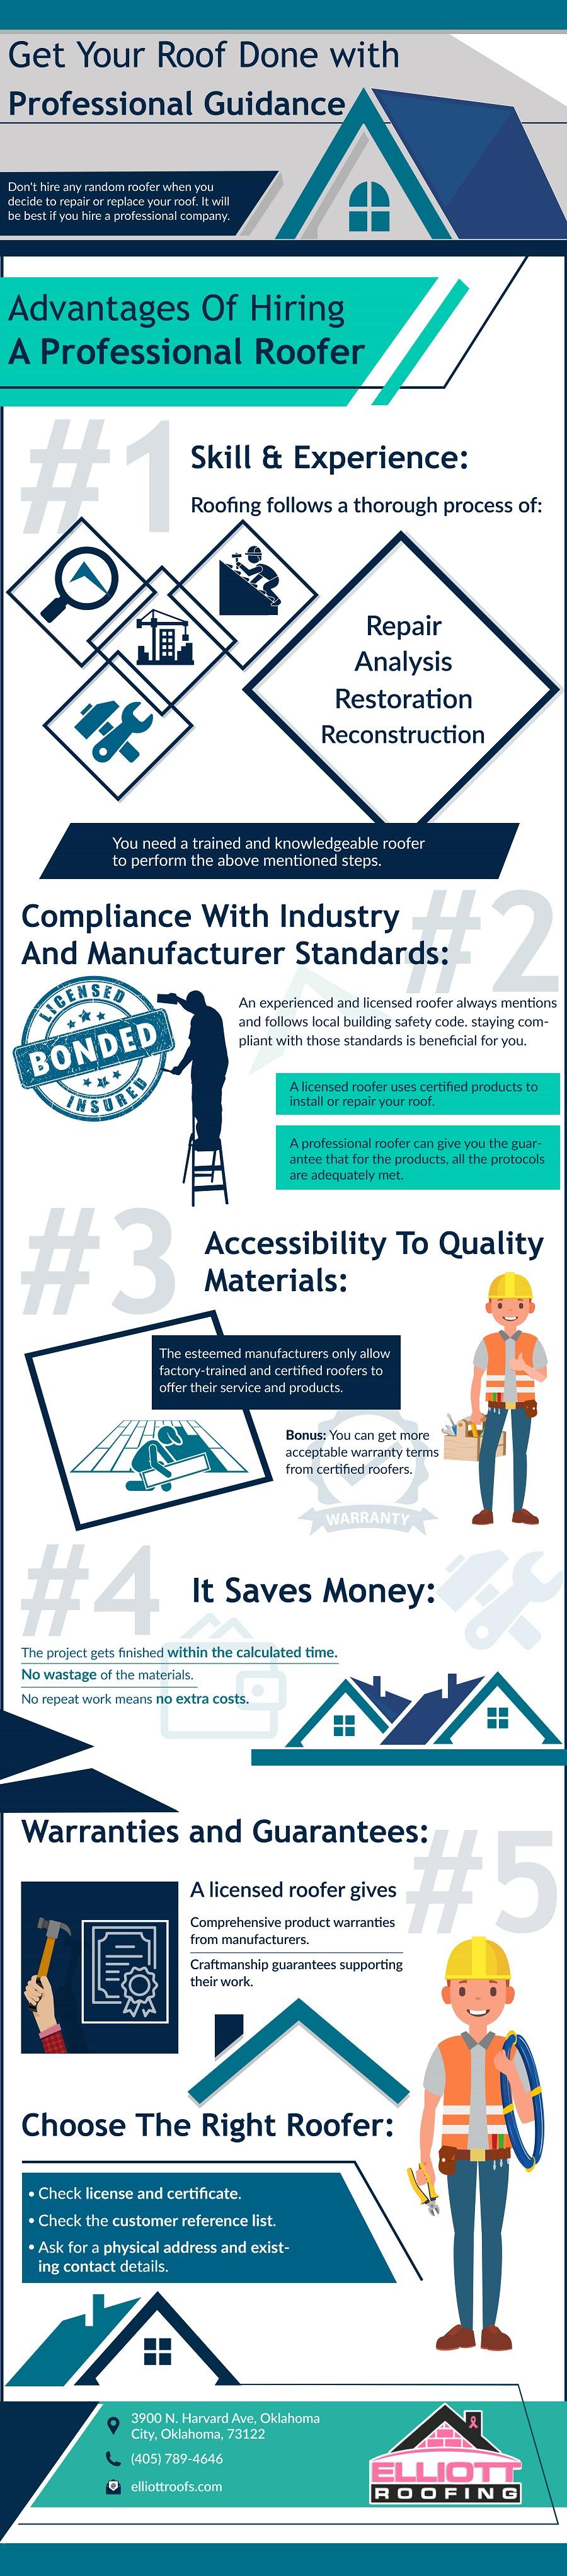 Advantages of hiring a professional roofer